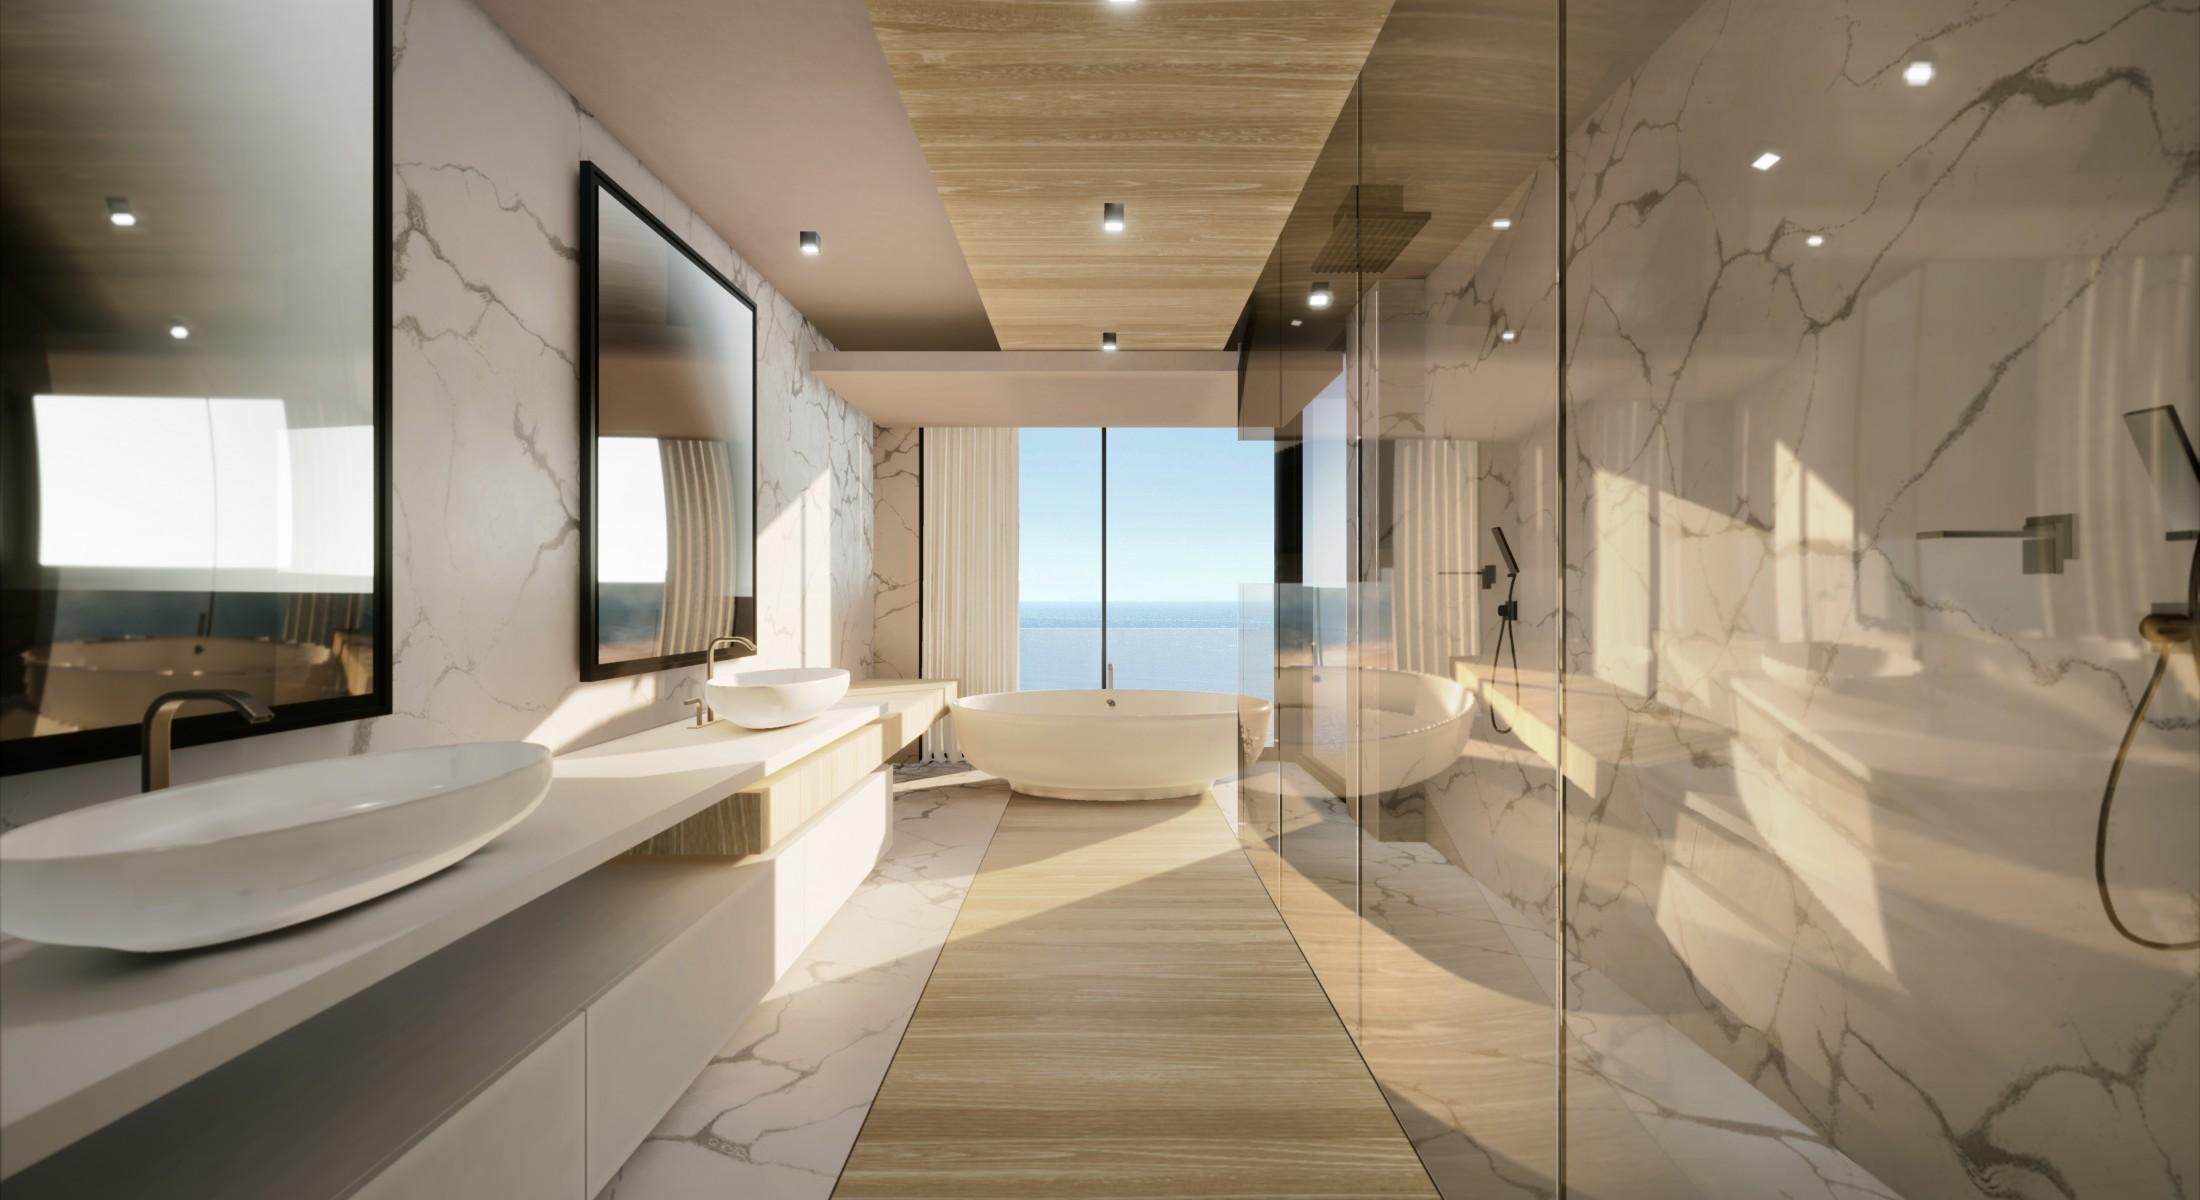 Sabal4005_Bathroom_FI_05-25-18